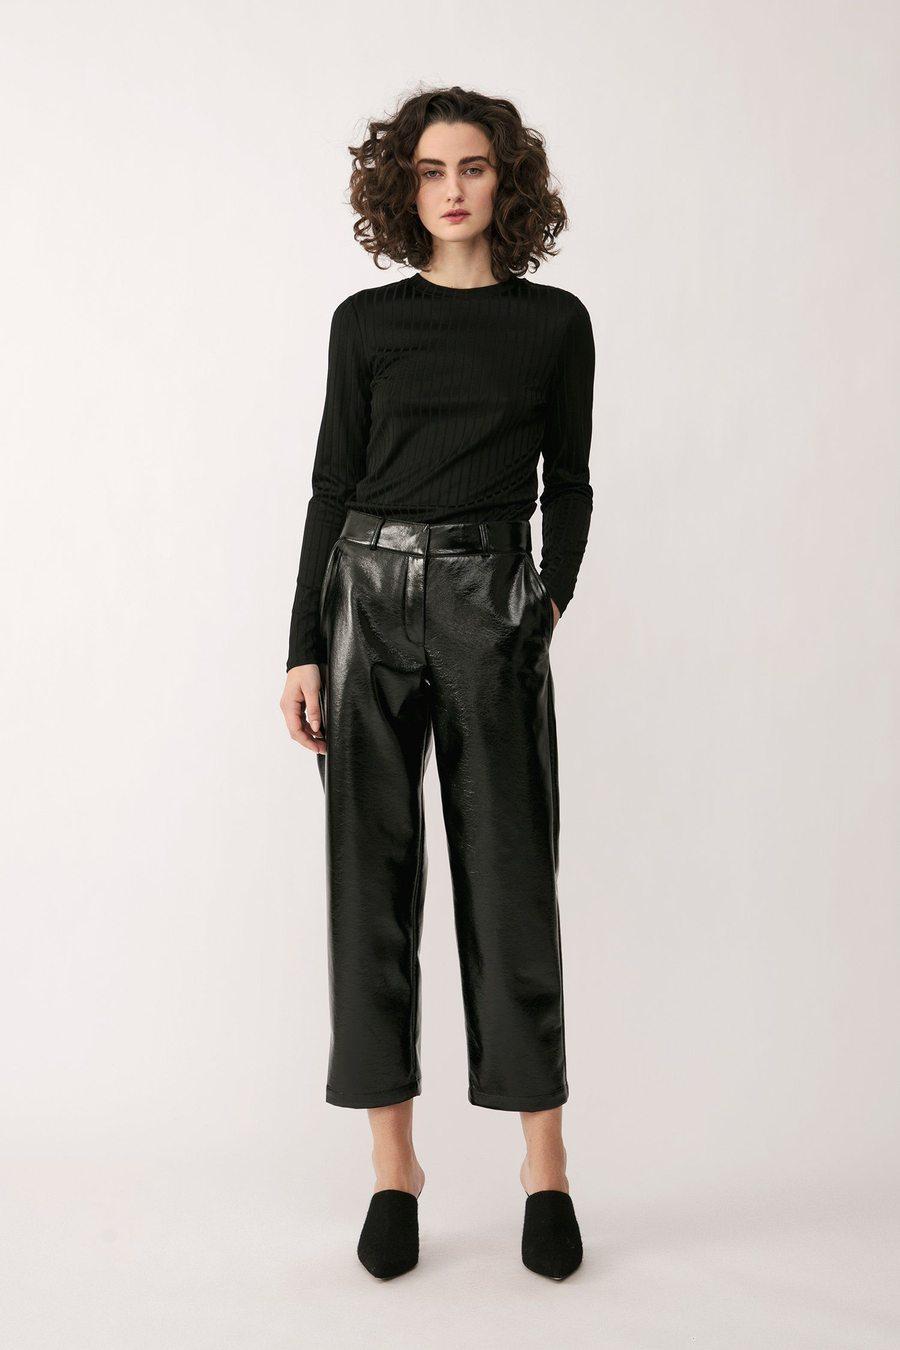 verde-trousers-black-trousers-stylein-646411_900x.jpg